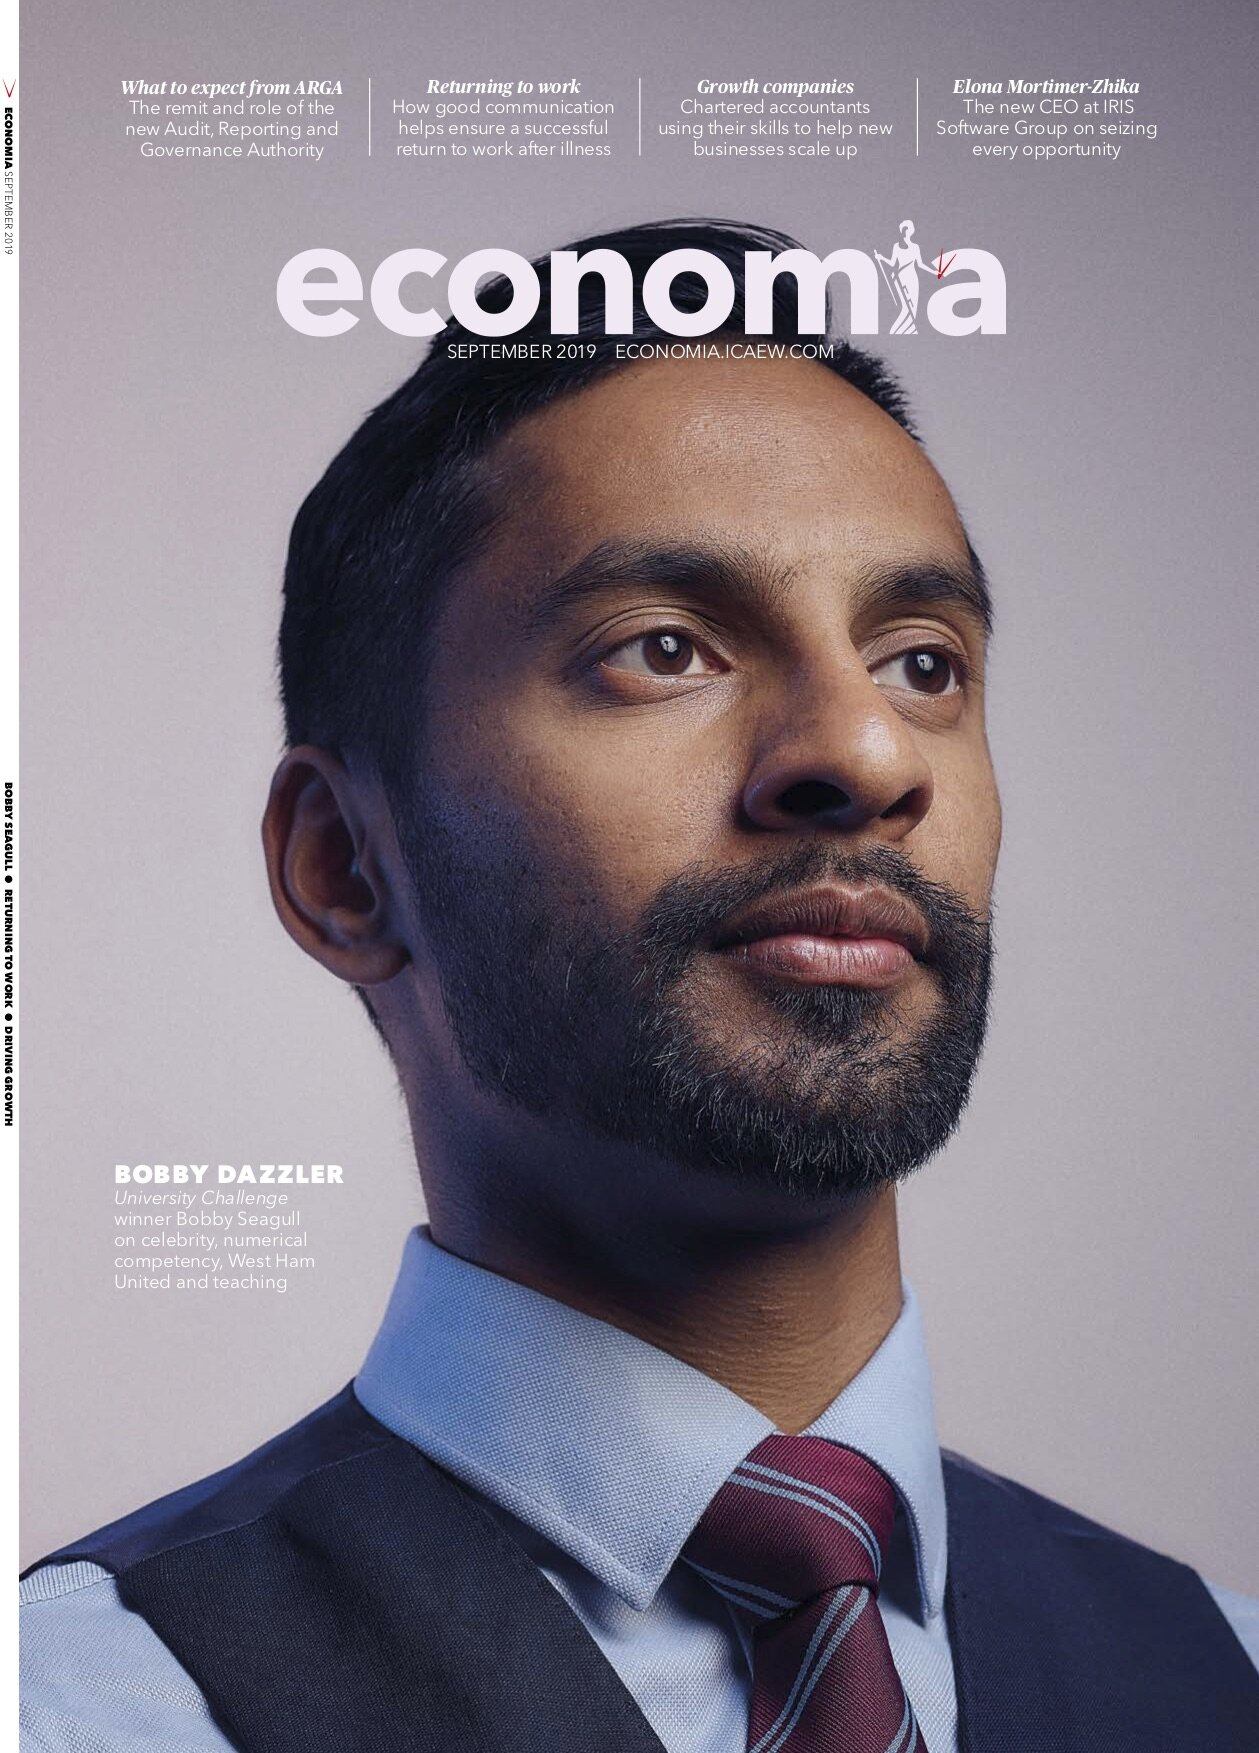 bobby seagull portrait economia magazine